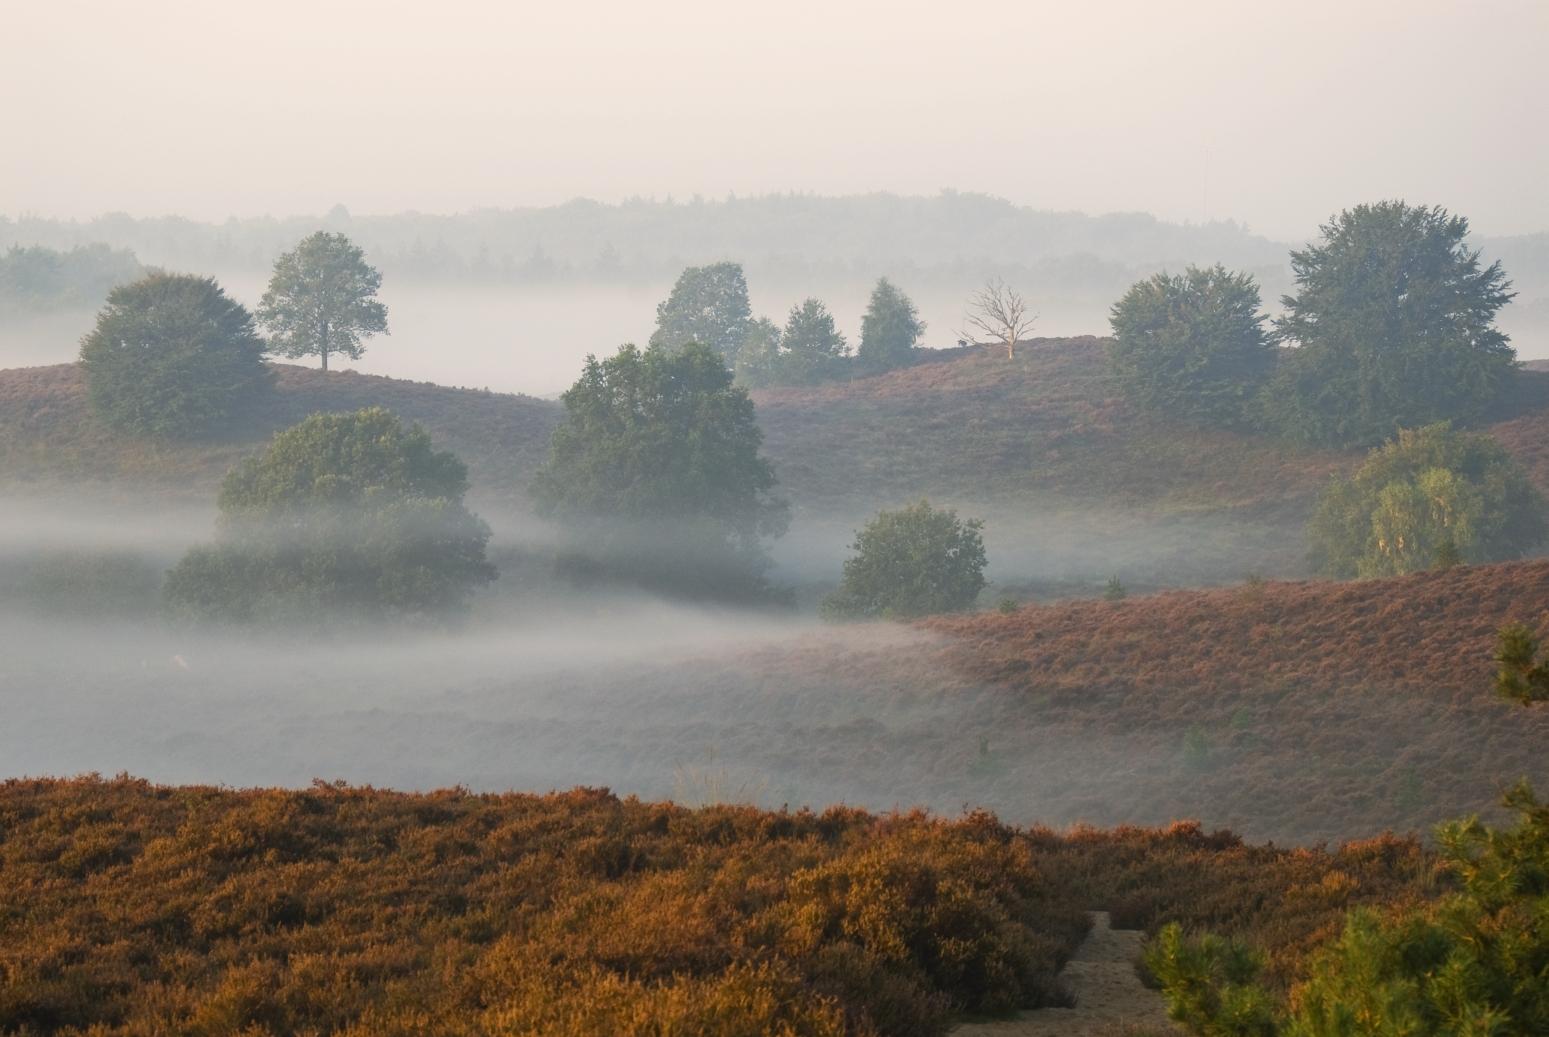 Early morning - fog location, Netherlands